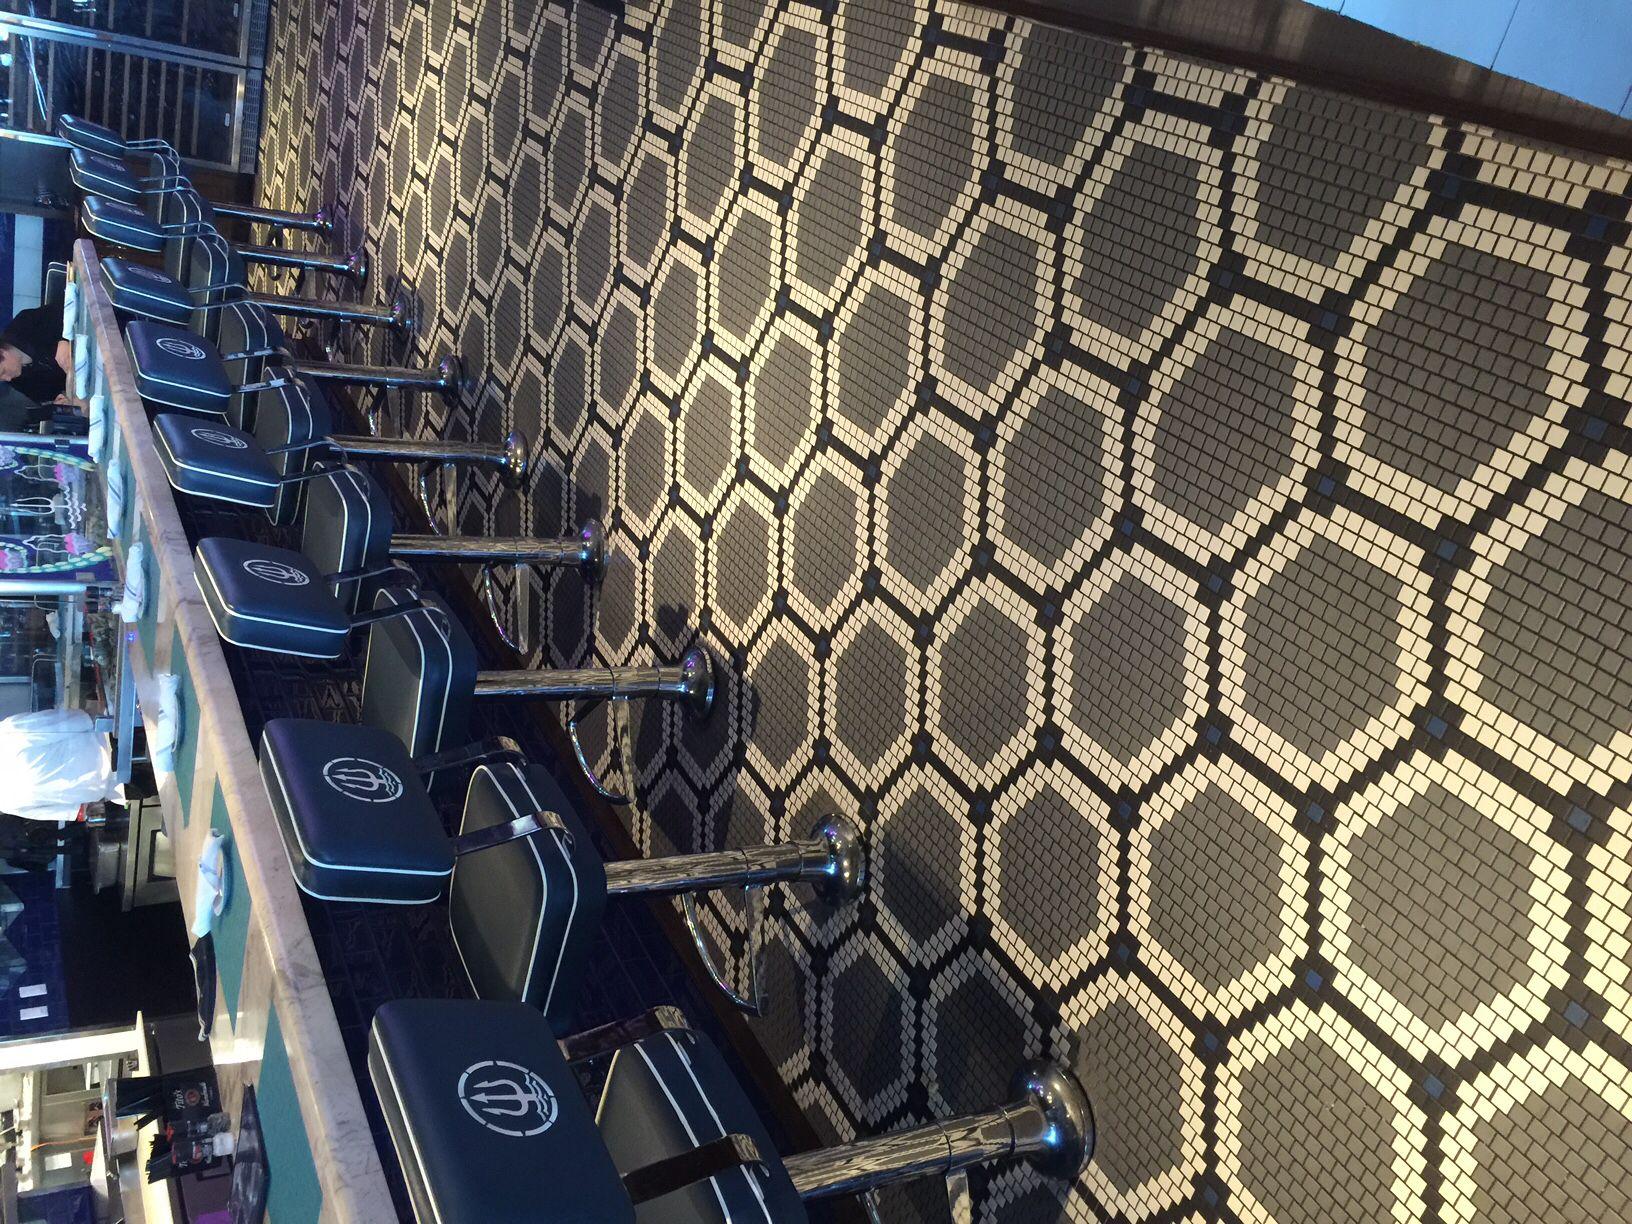 daltile keystone 1x1 mosaic pattern daltile pinterest interiors